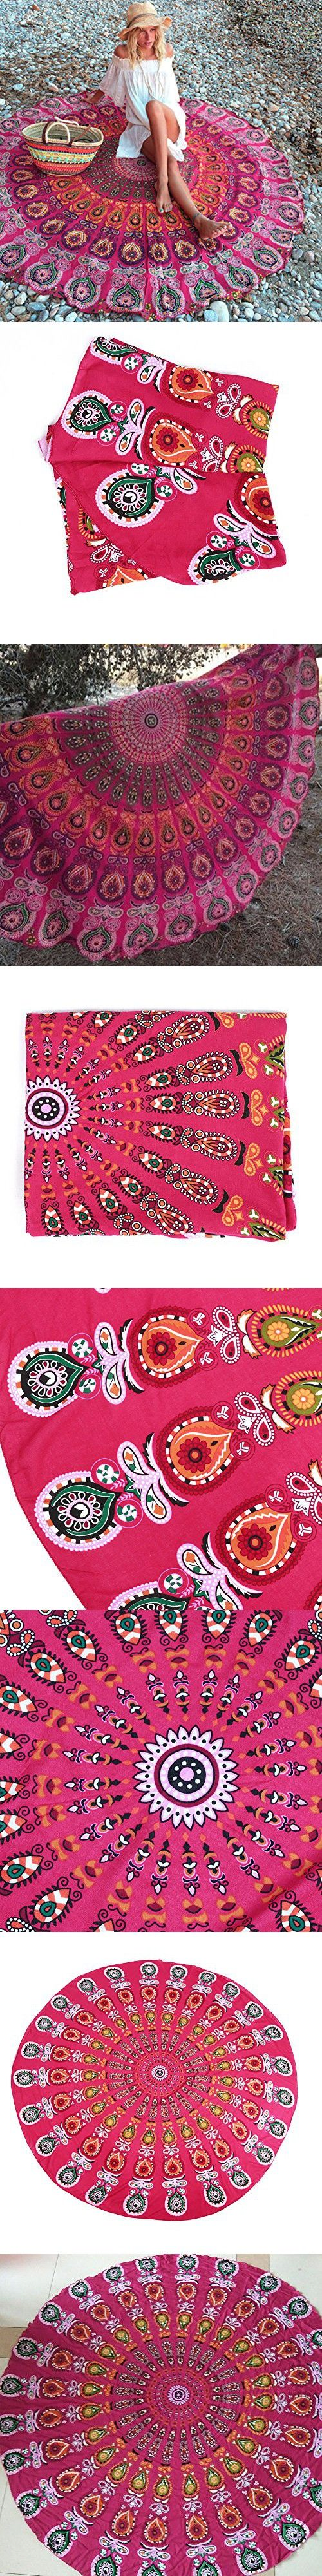 NALEDI Beach Cloth Cotton Mandala Round Towels, Beach Throw, Yoga Mat, Picnic Mat , Table Throw(Red)